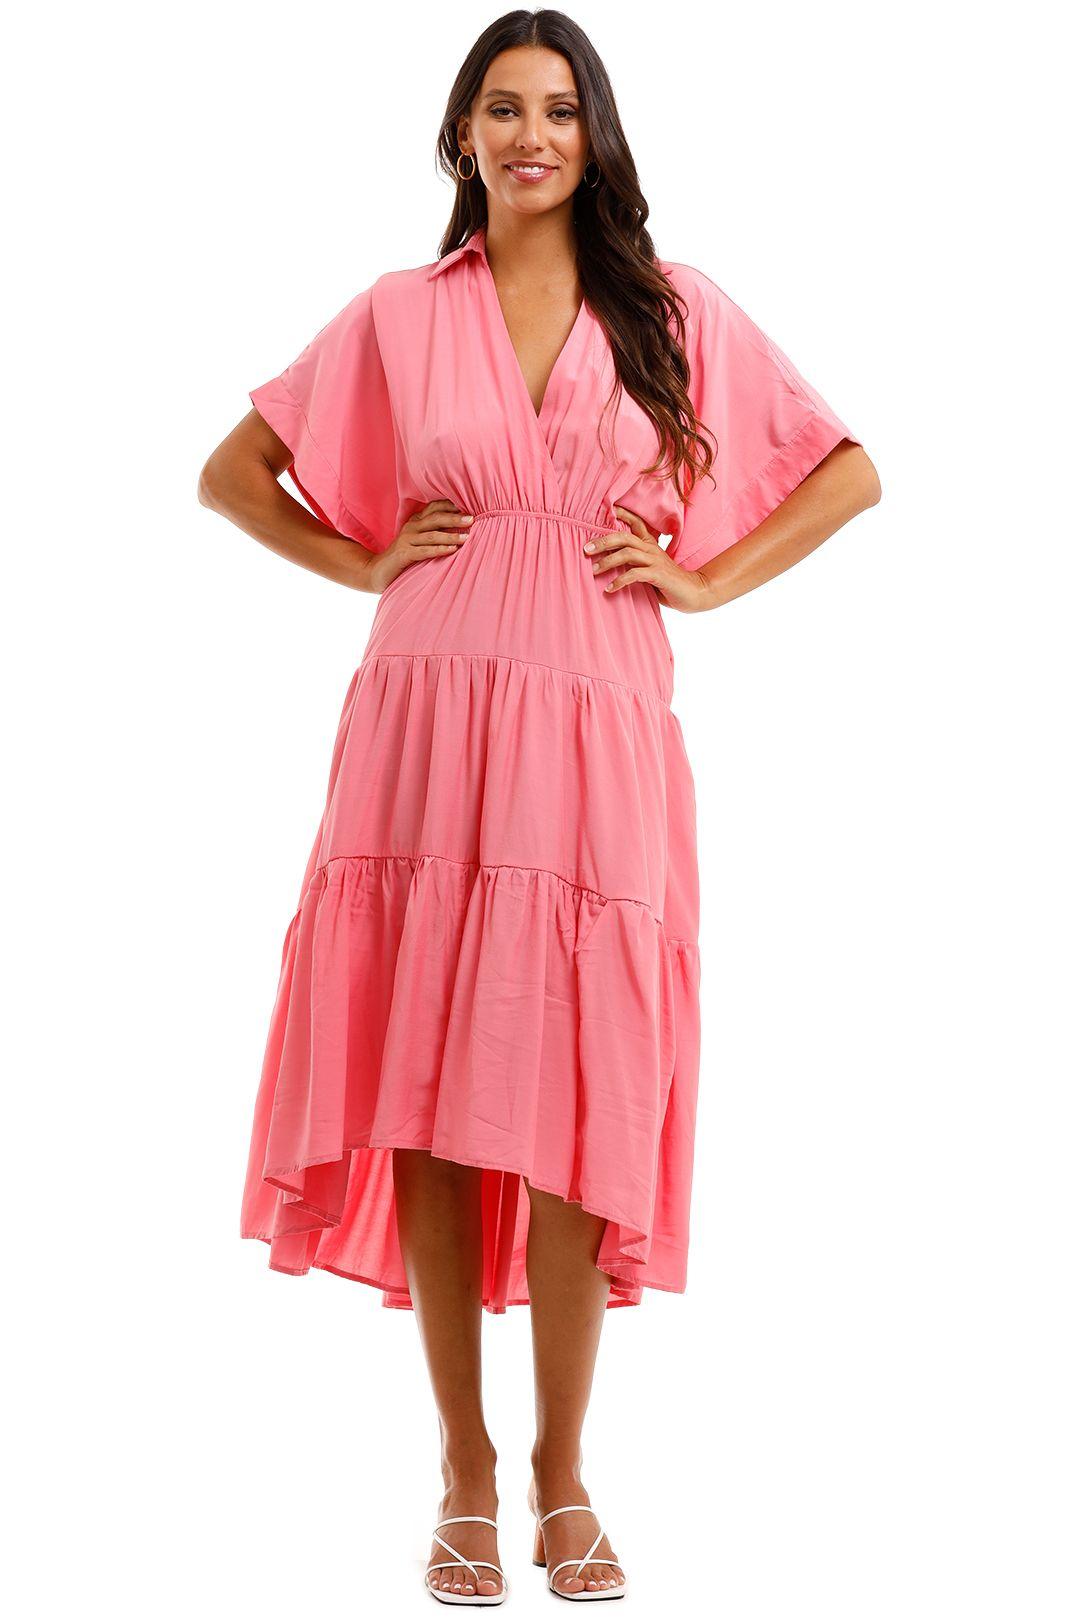 Sheike Sundays Dress Pink